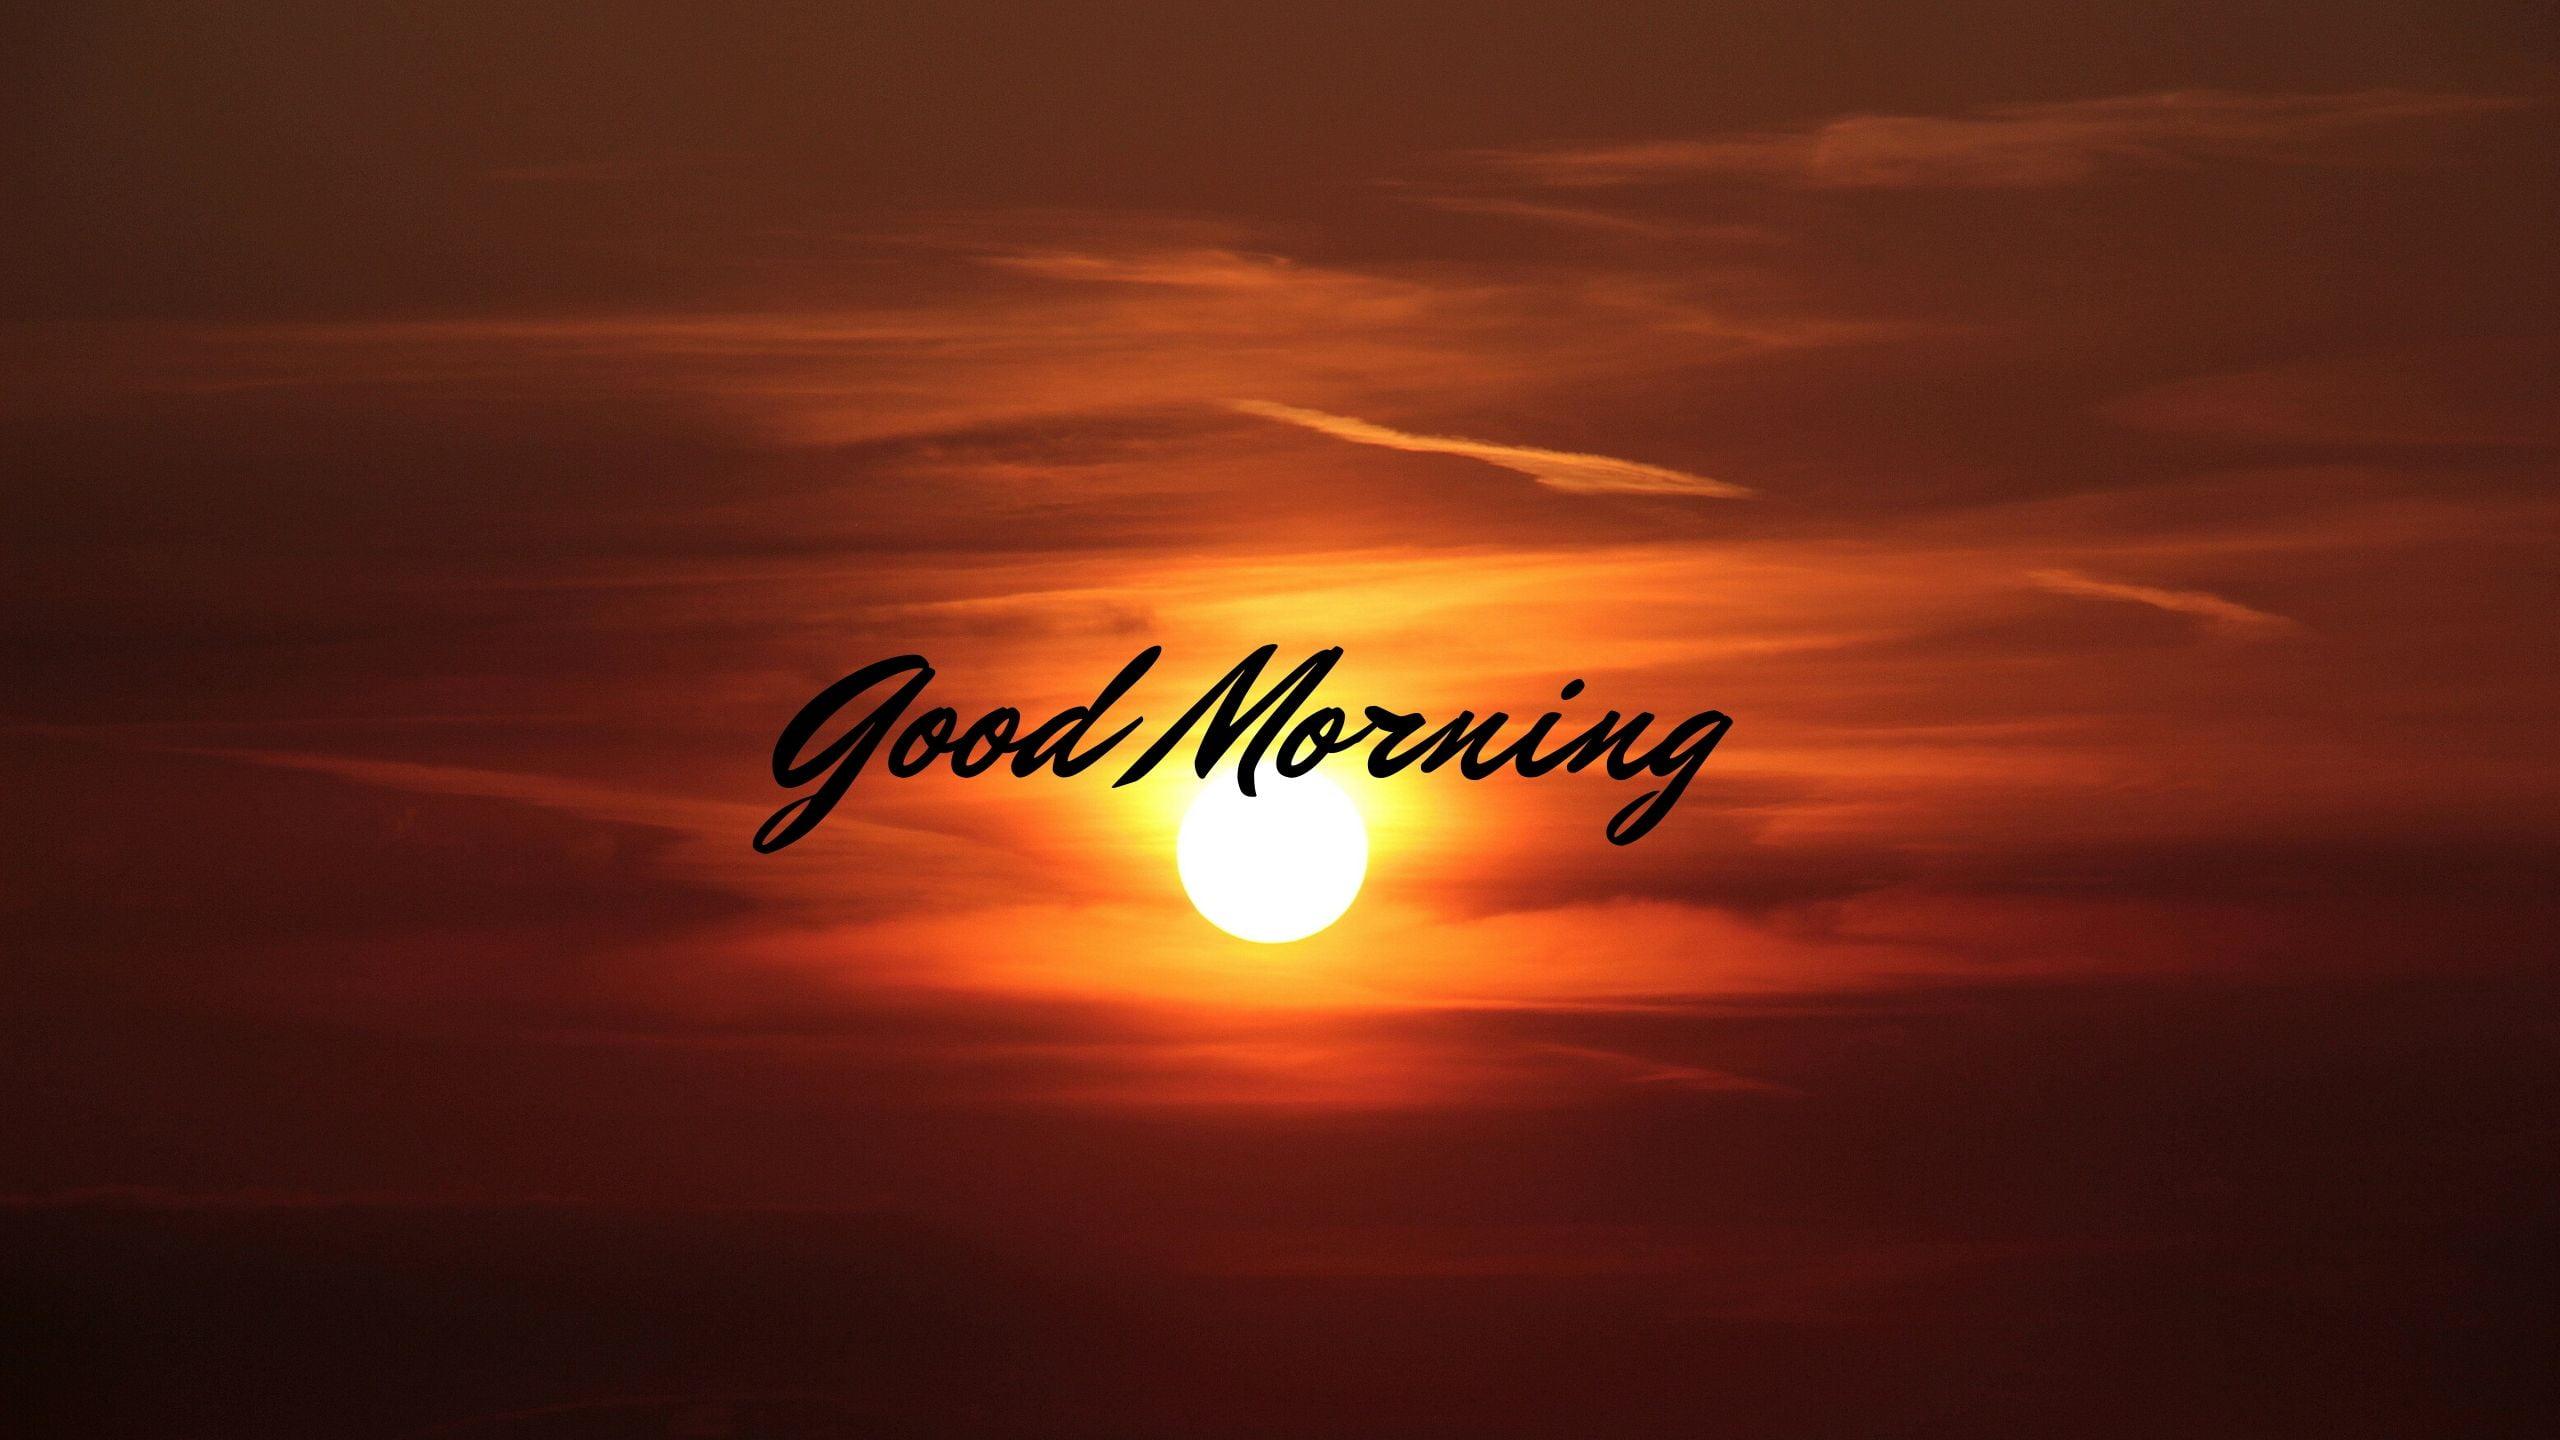 Sun Good Morning Hd Image full HD free download.